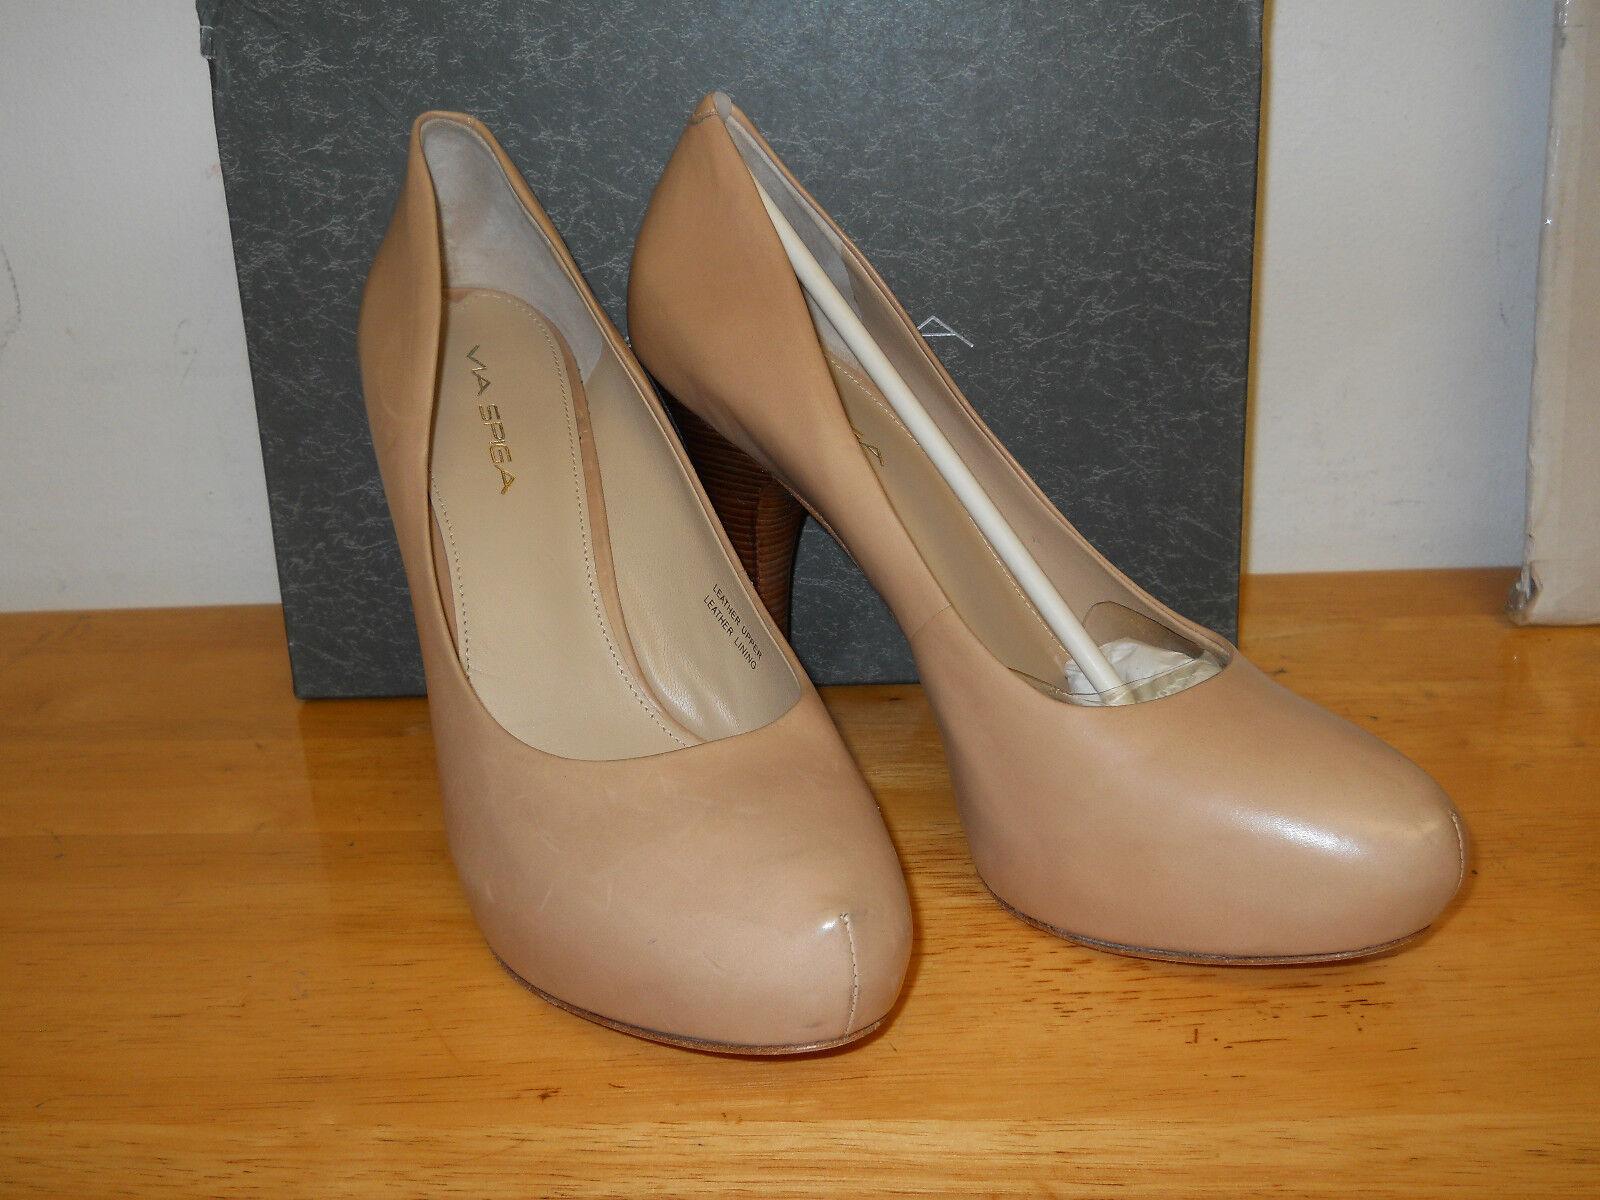 Via Spiga New Store Display damen Anita Capucino Leather Heels 10 M schuhe NWB